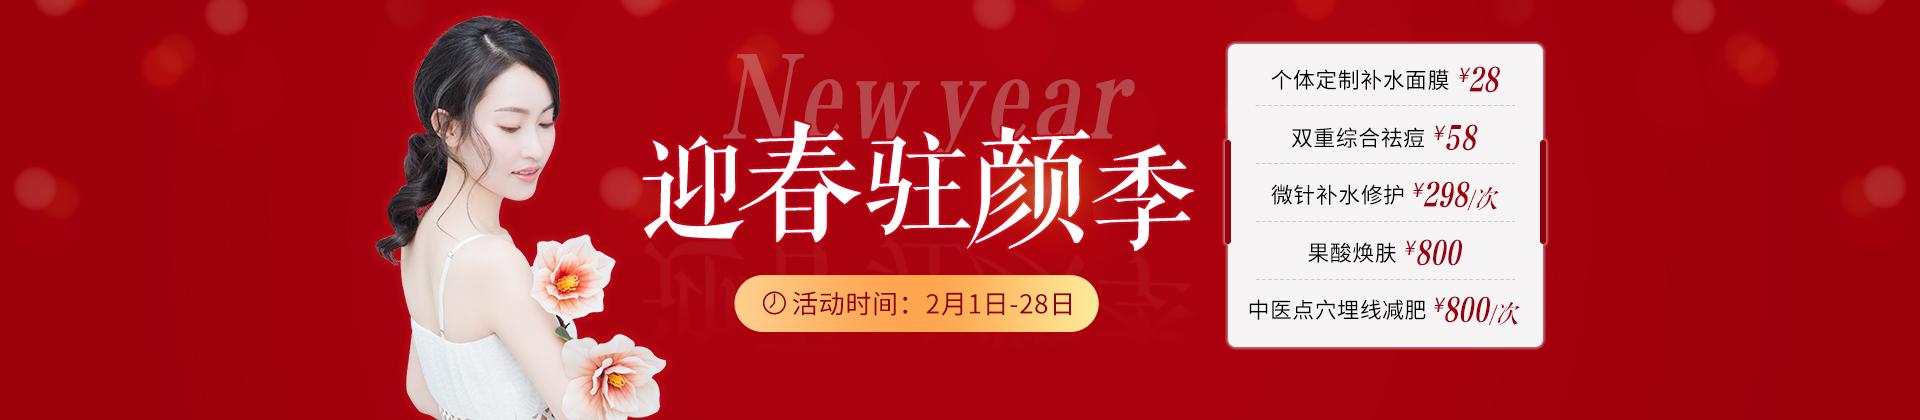 new year迎春驻颜季